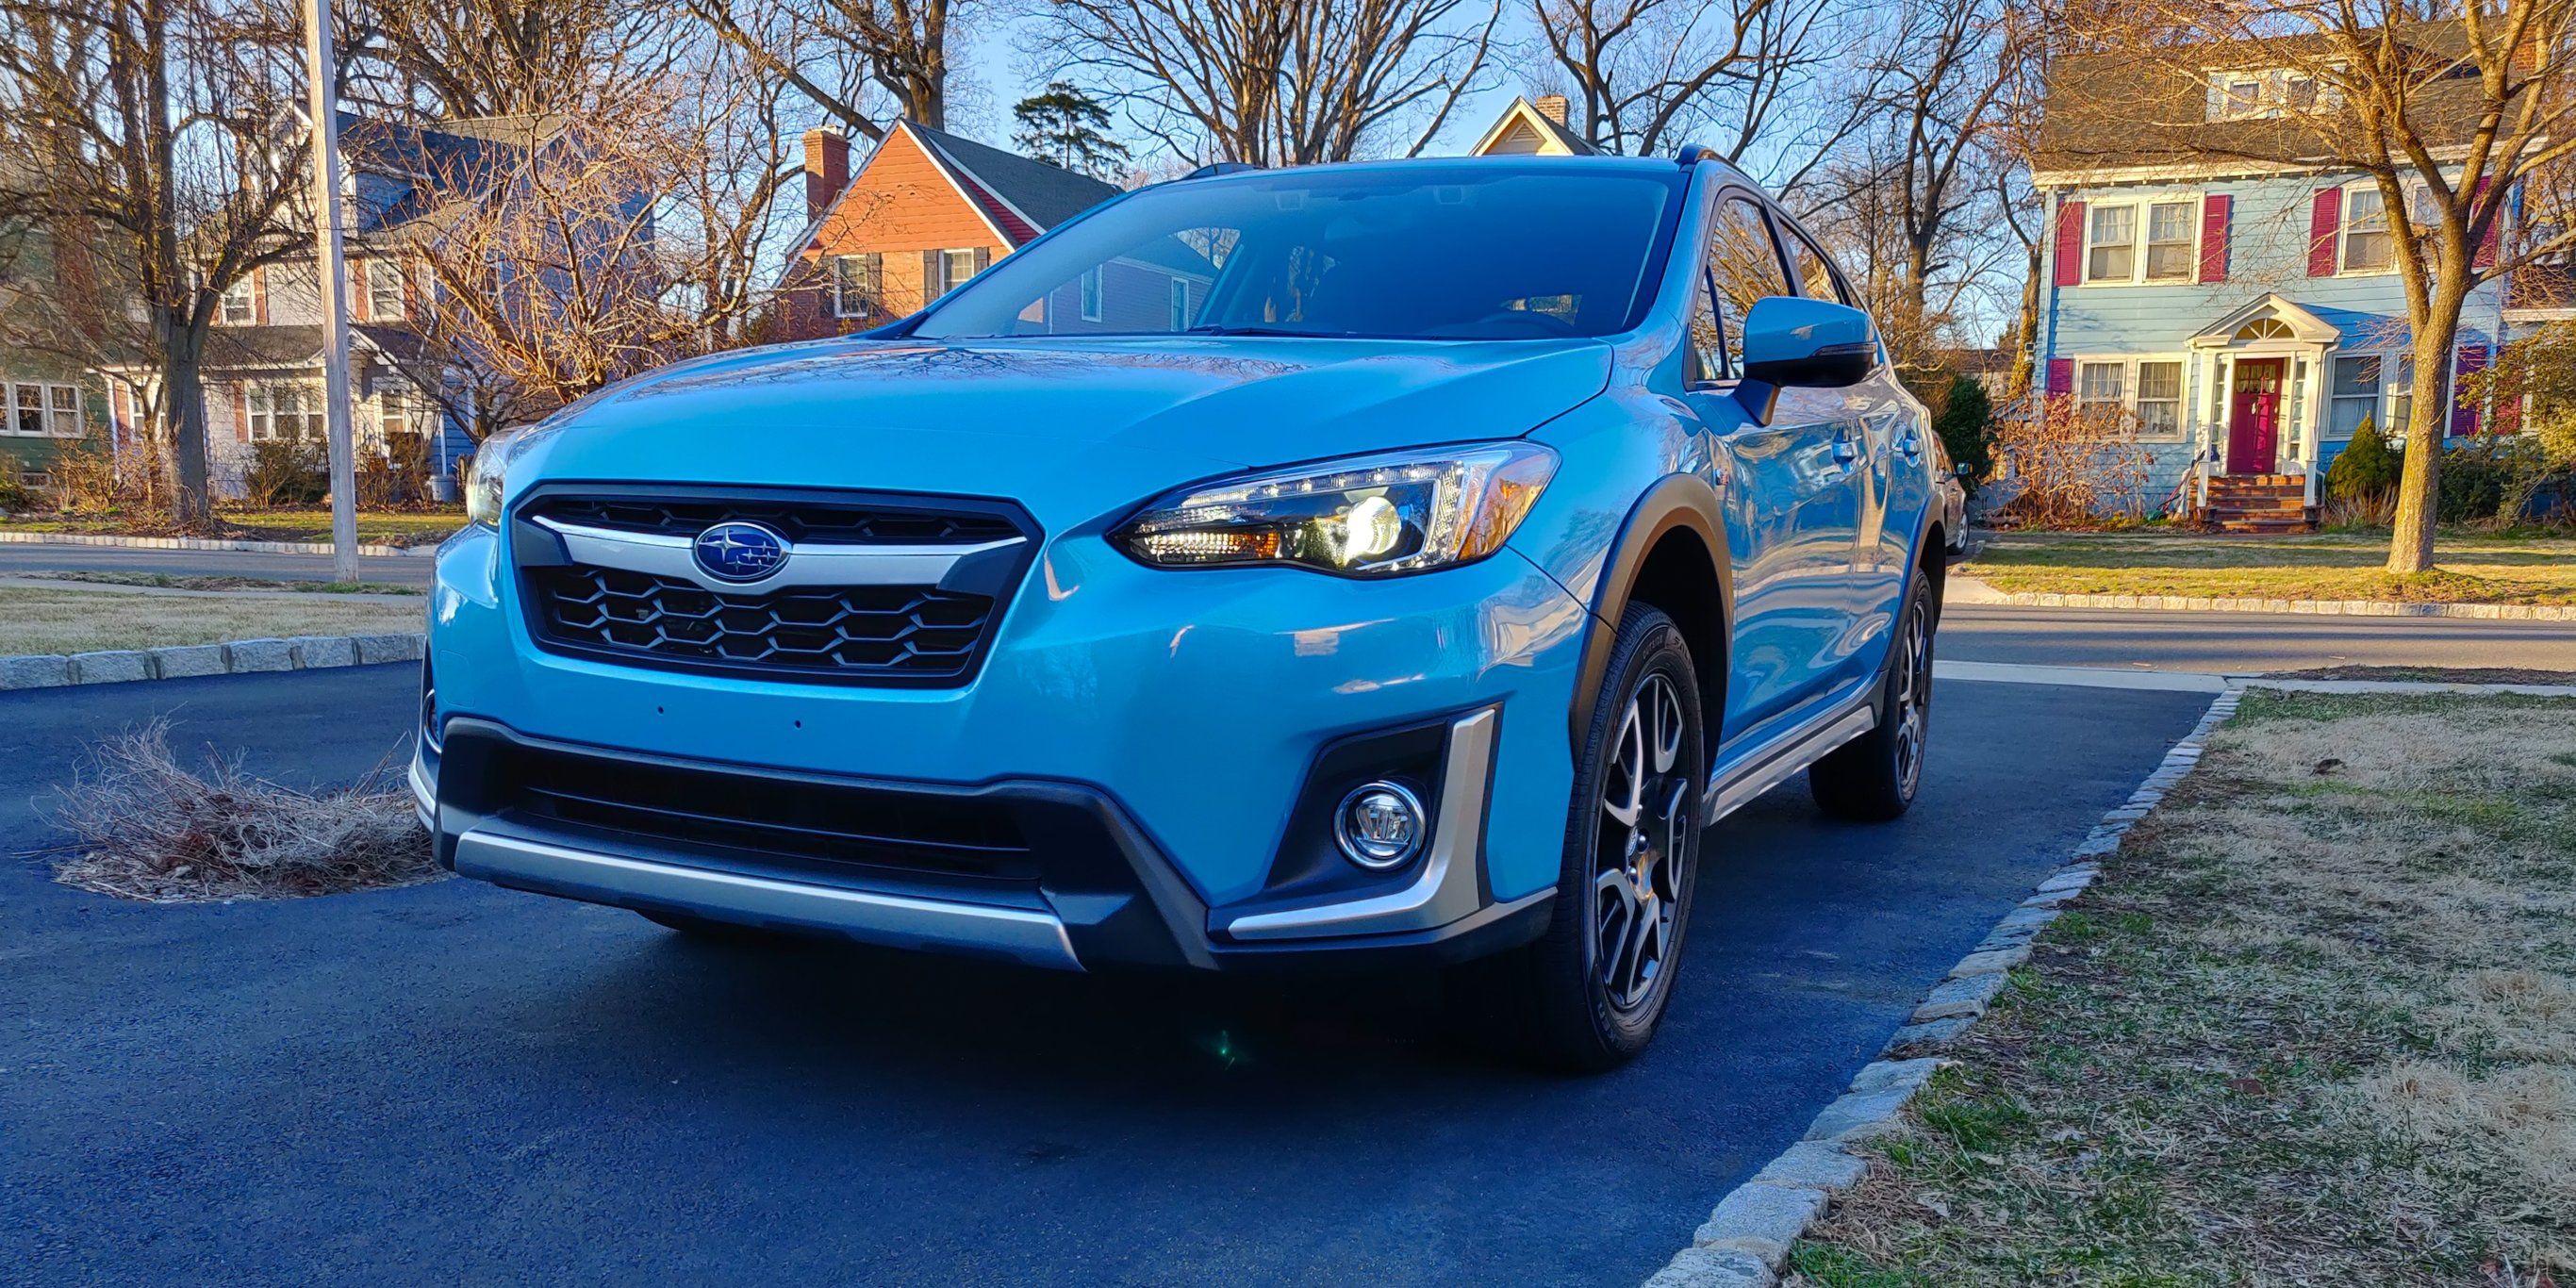 We Drove A 38 000 Subaru Crosstrek Hybrid For A Week And Discovered Its Best Features Subaru Crosstrek Subaru Crossover Suv